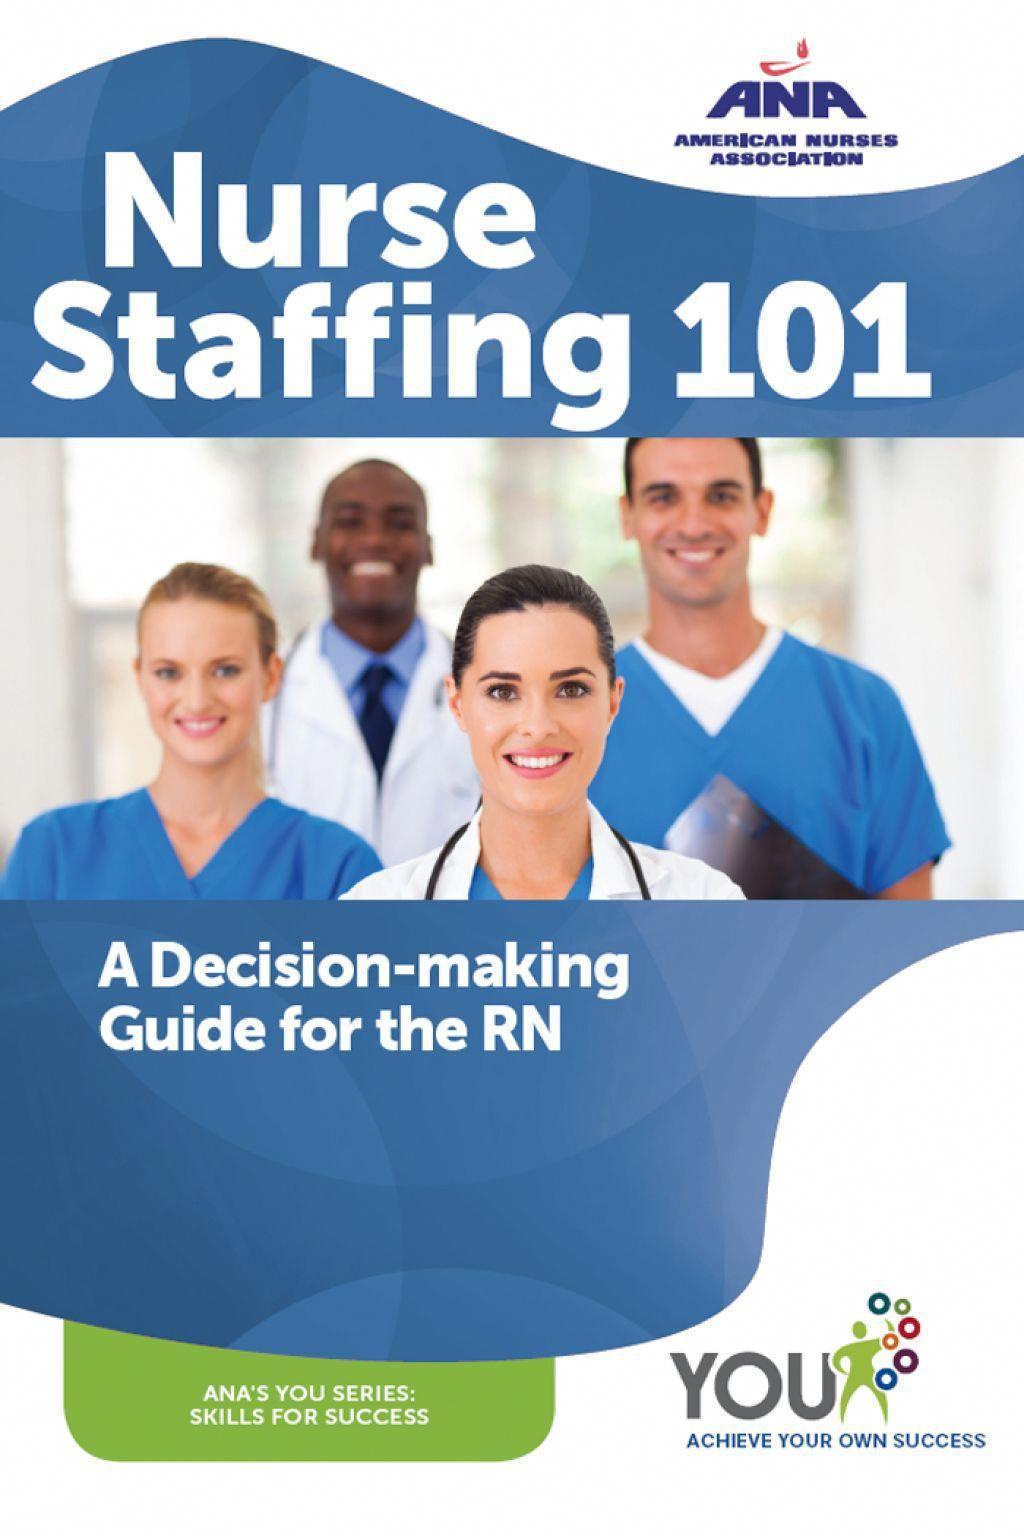 Lpn Salary in Florida LPNSalary Nurse staffing, Nursing